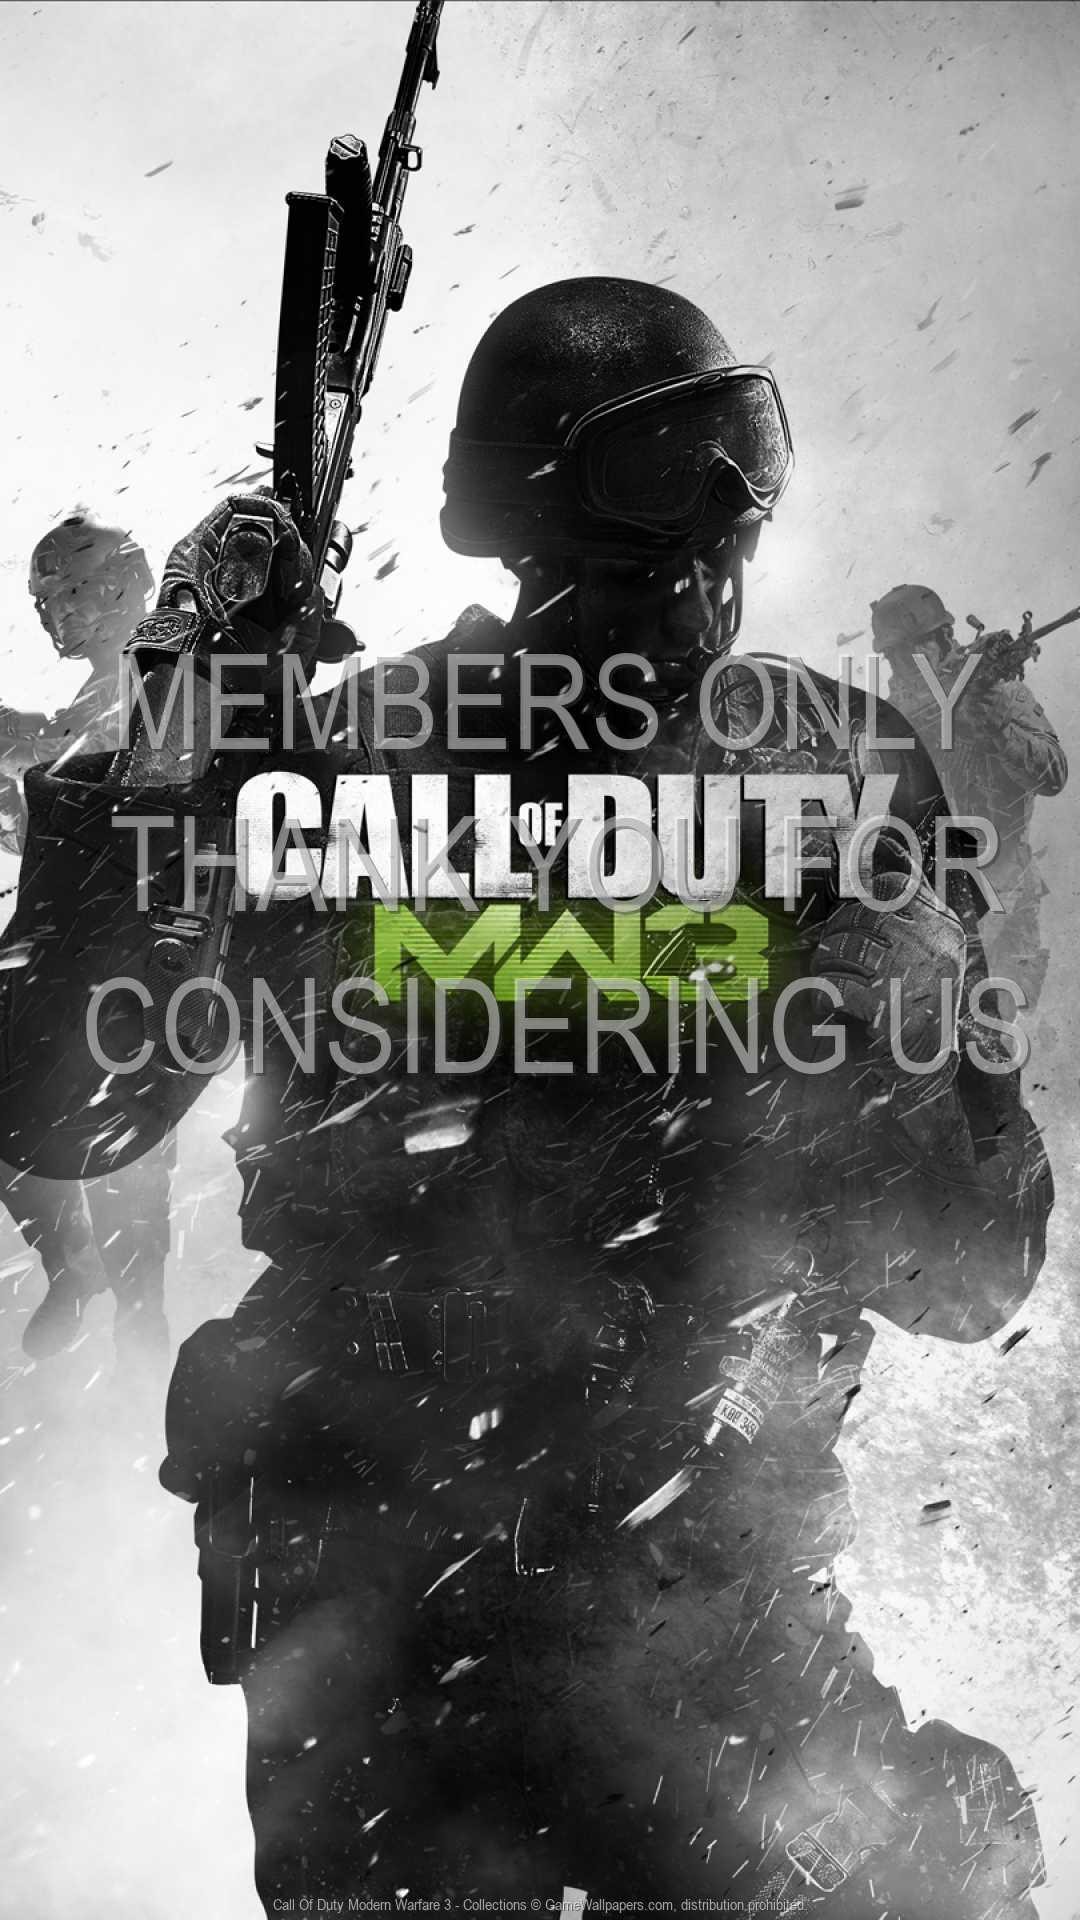 Call Of Duty: Modern Warfare 3 - Collections 1080p Vertical Handy Hintergrundbild 02